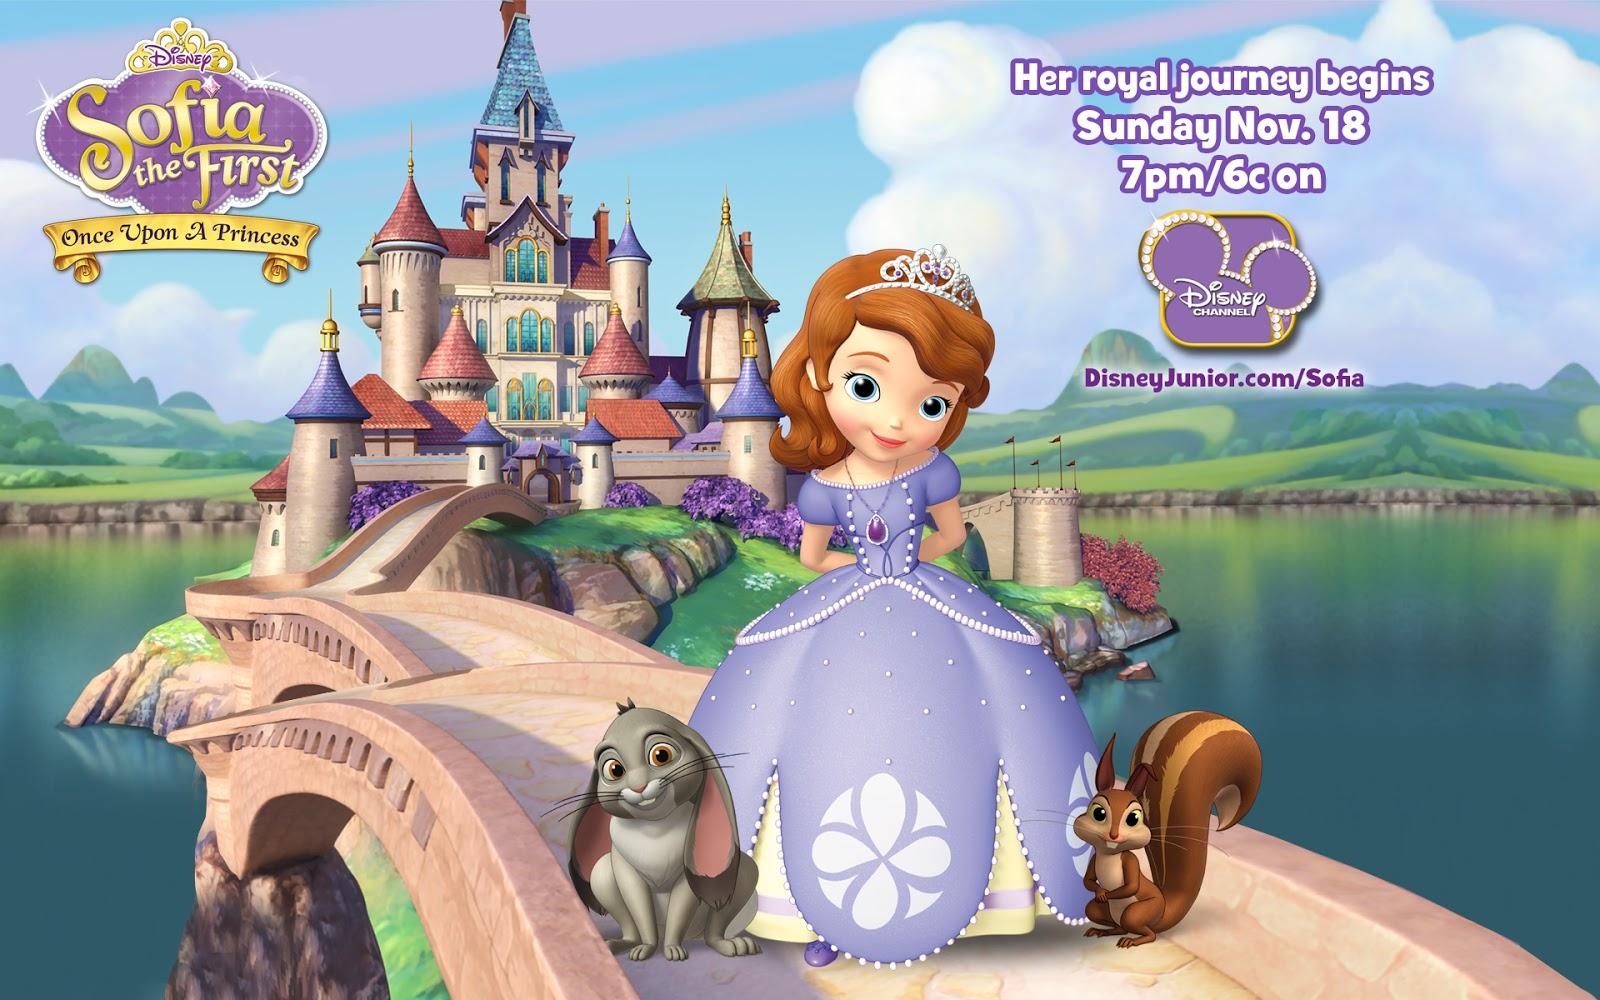 2012+2013+la+princesa+sofia+erase+una+vez+una+princesa+walt+disney.jpg